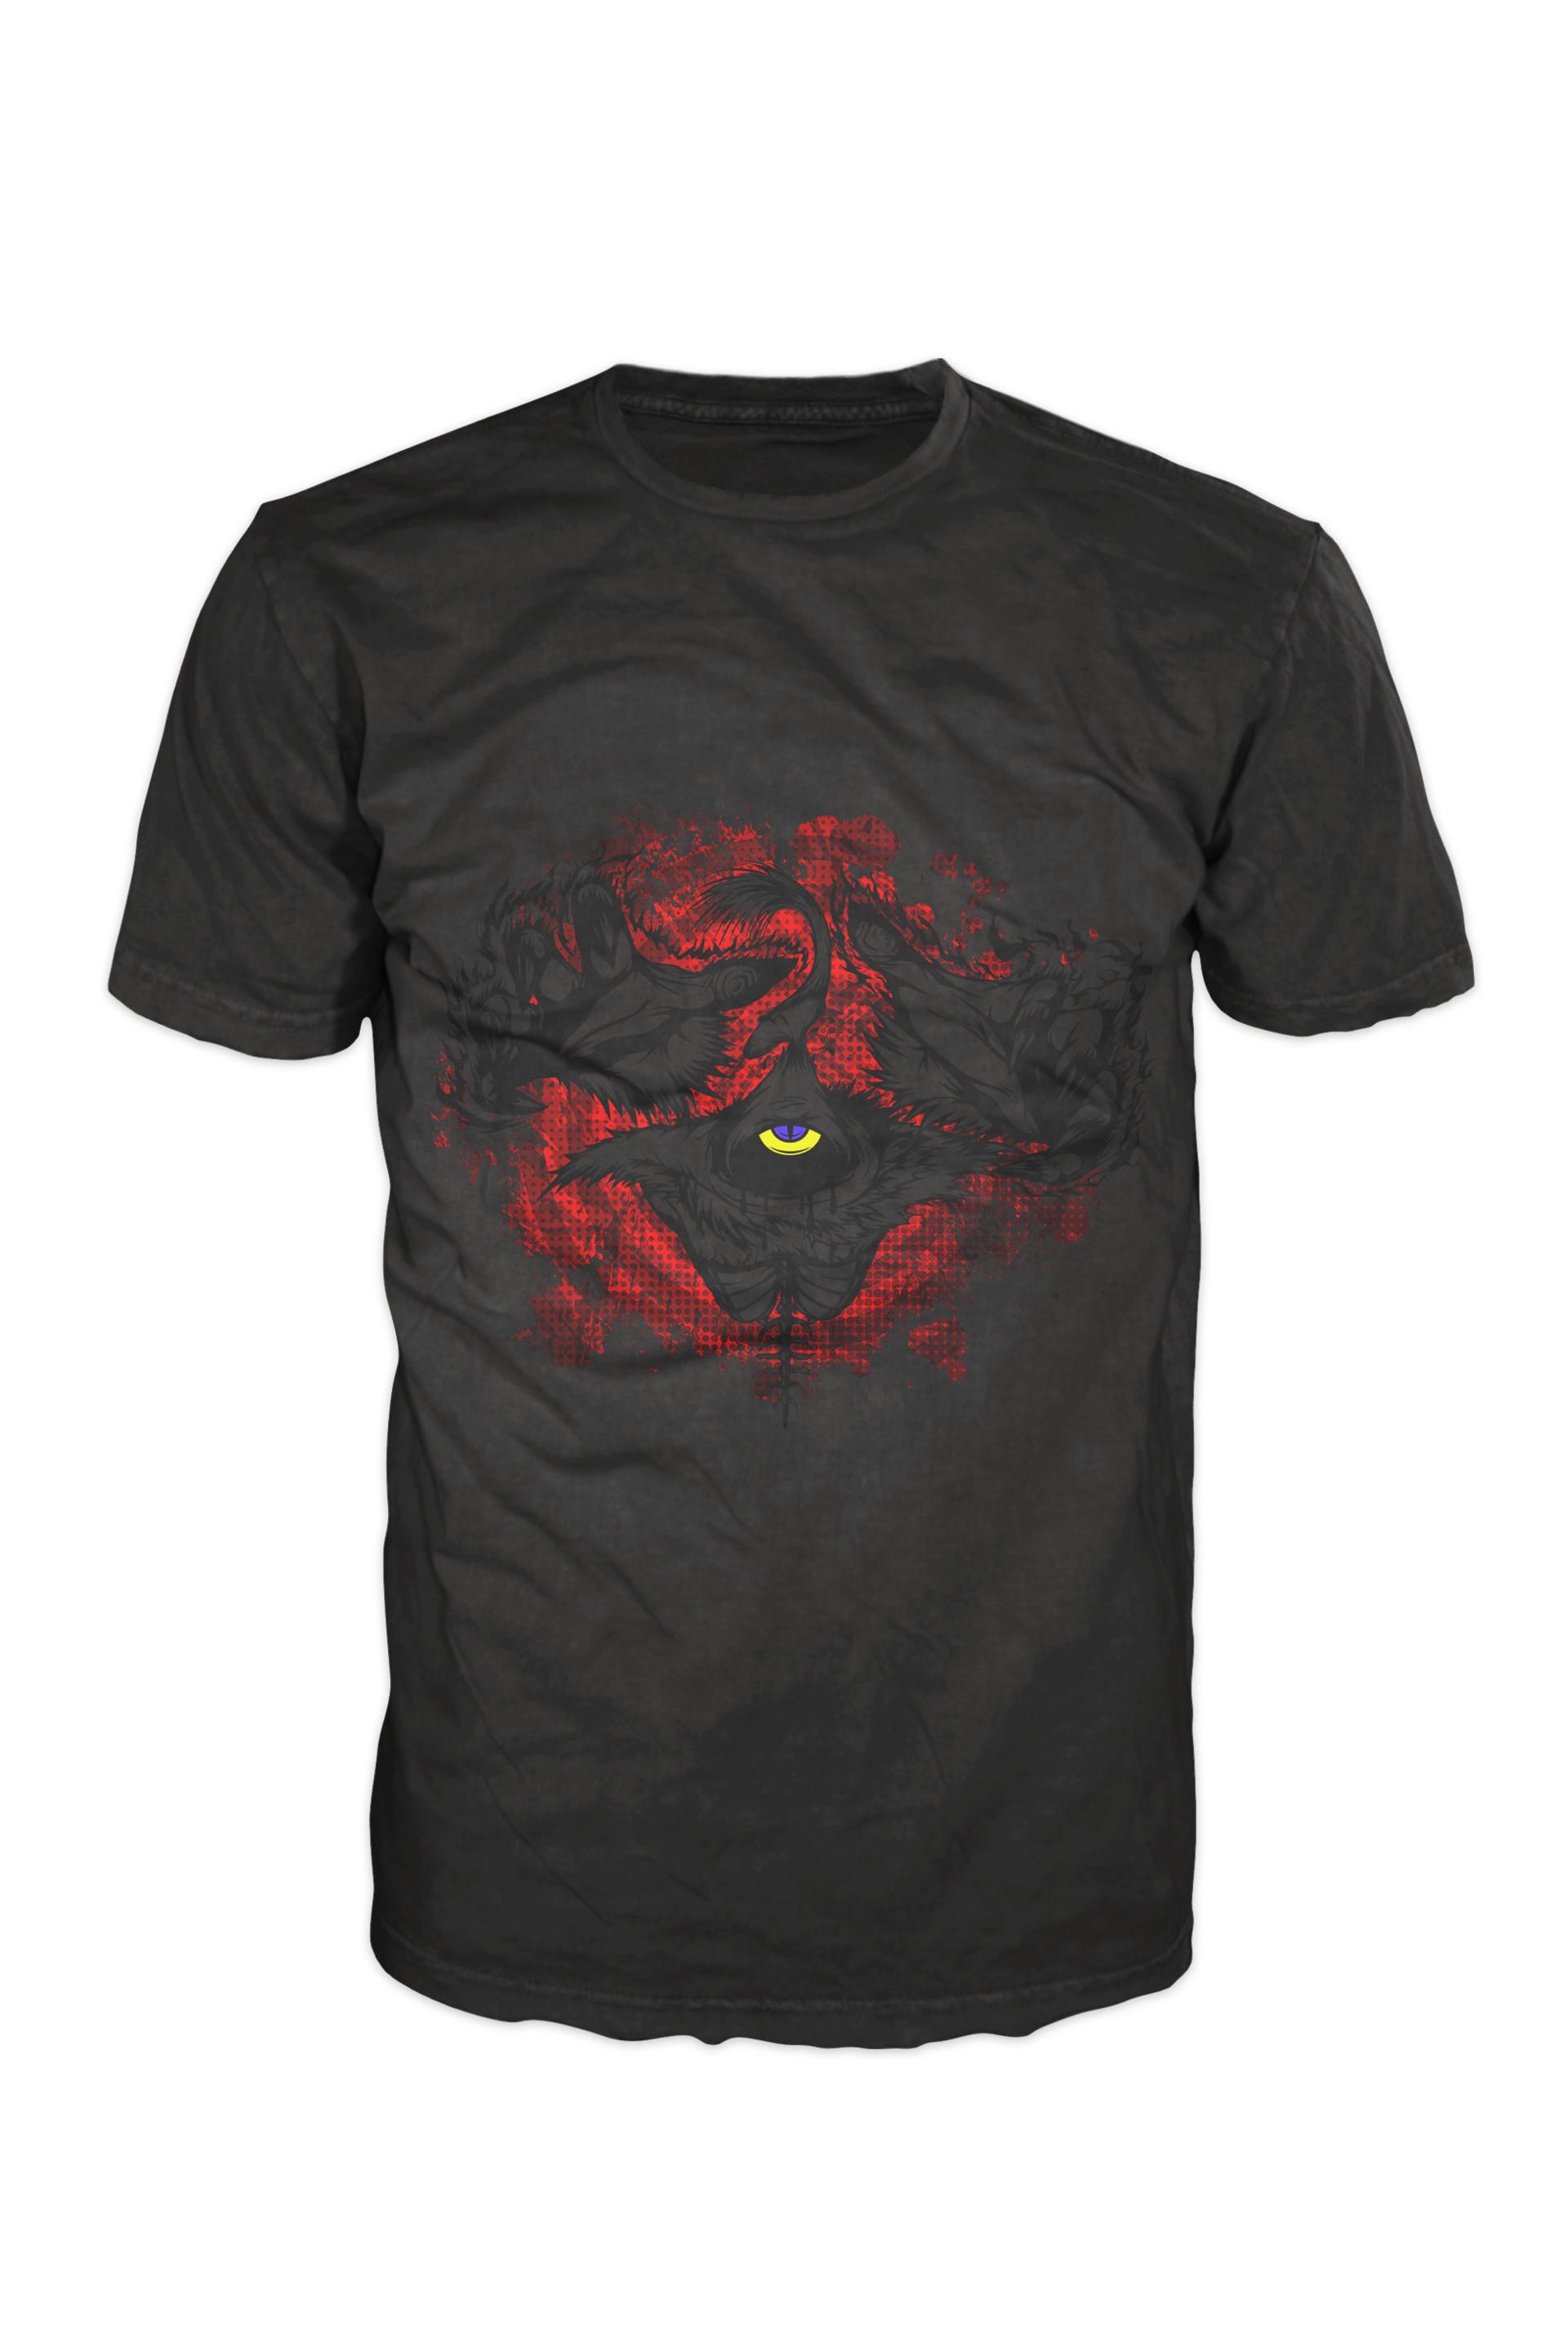 Nathaniel scramling the void shirt4